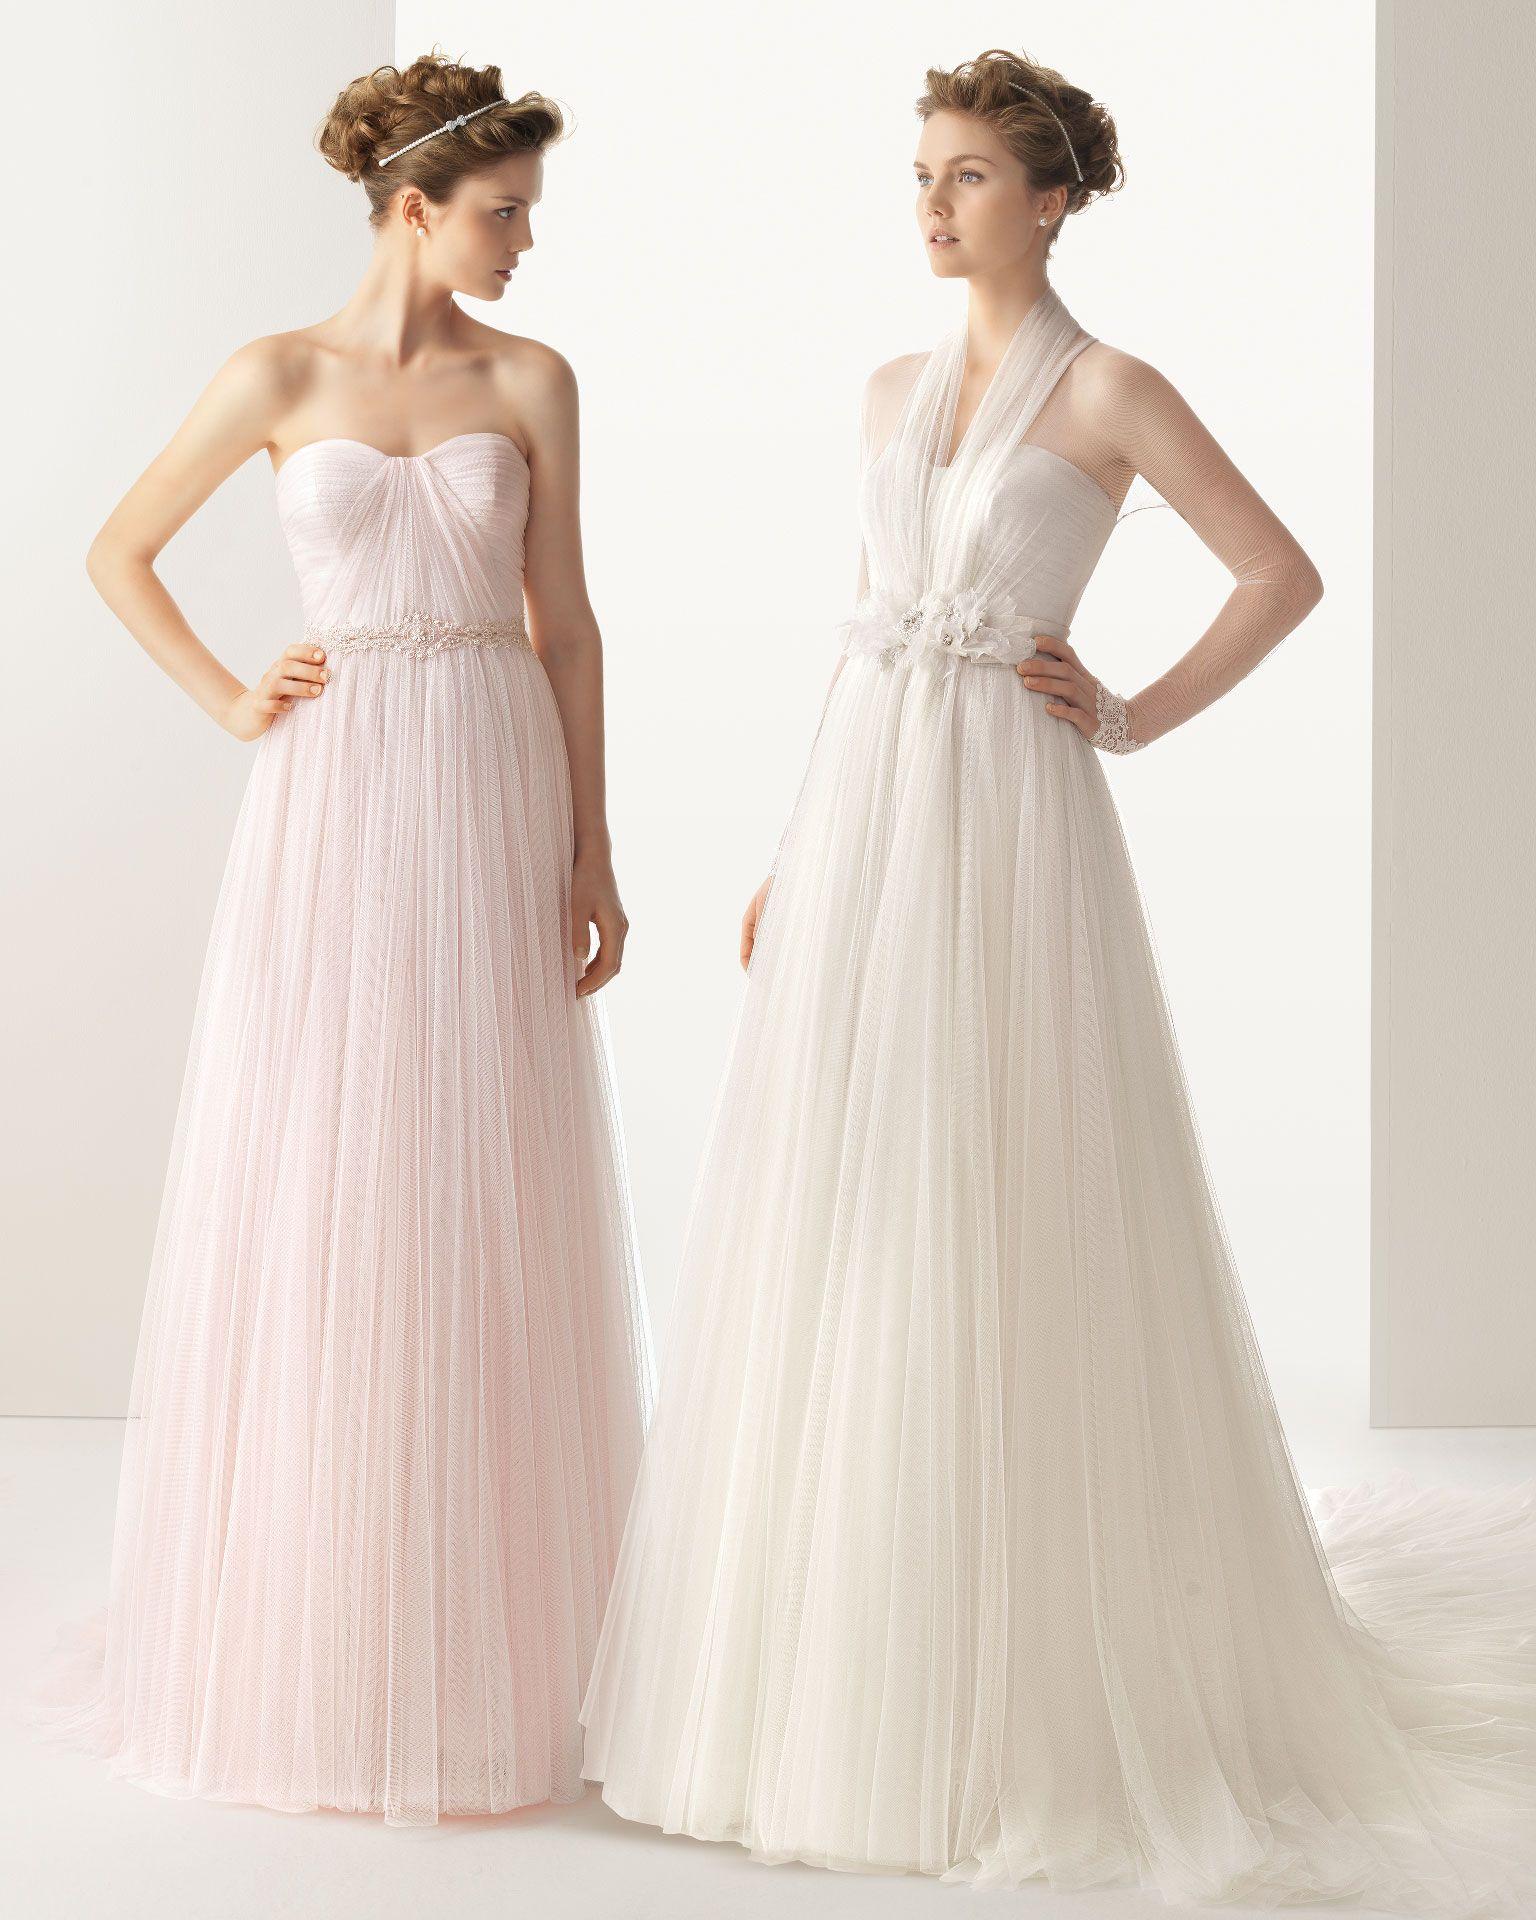 Ural soft by rosa clara wedding dresses pinterest rosa